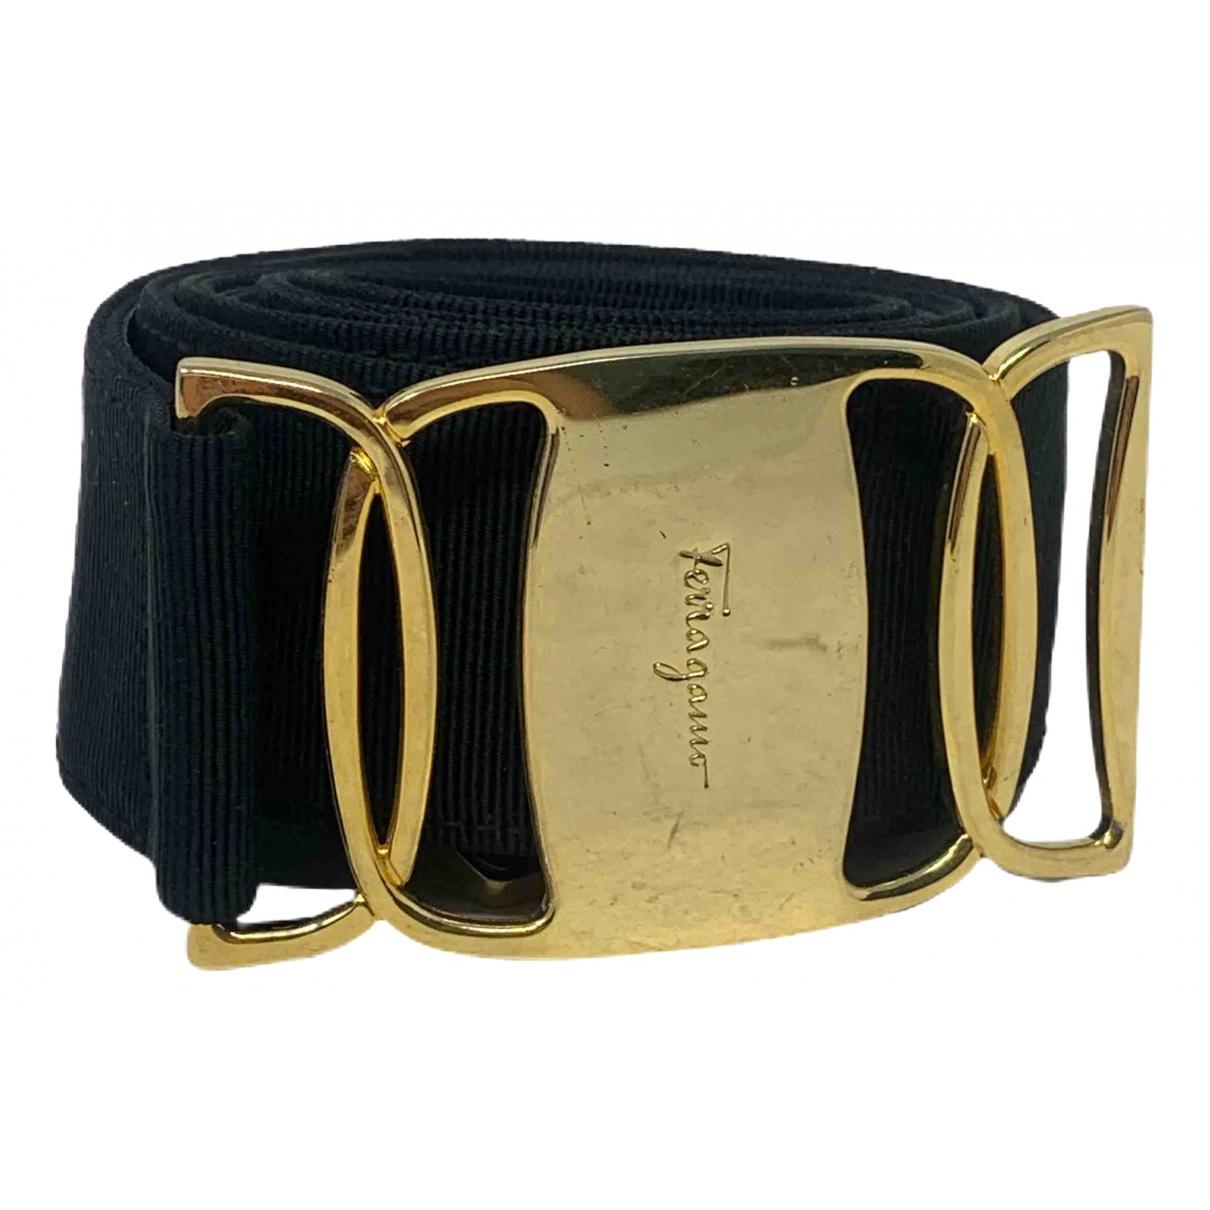 Salvatore Ferragamo \N Black Cloth belt for Women L International